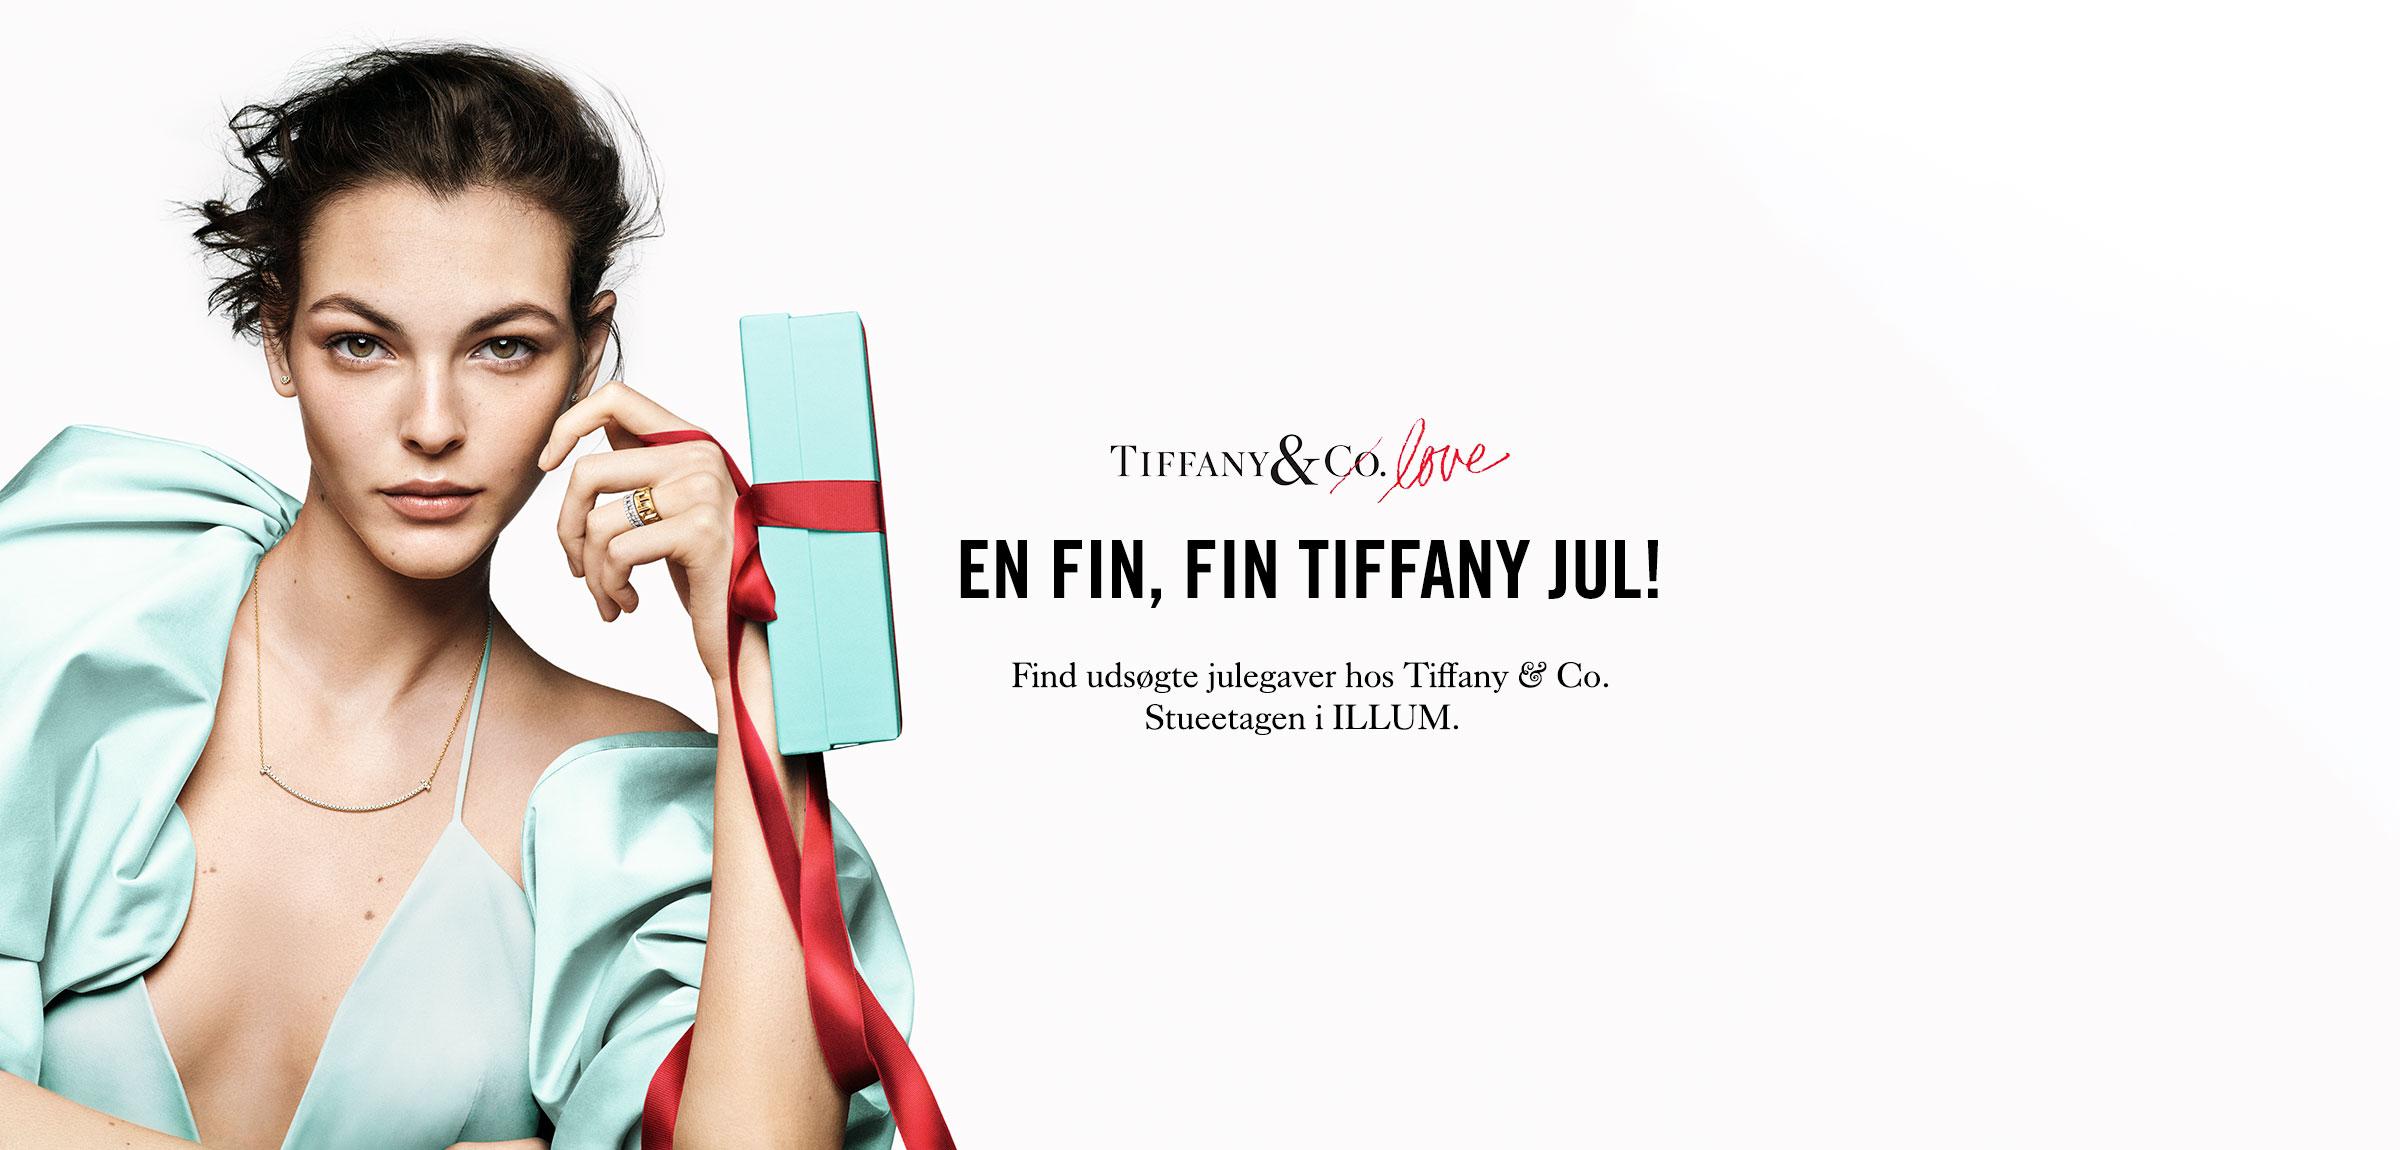 Tiffany's (DK – Homepage)